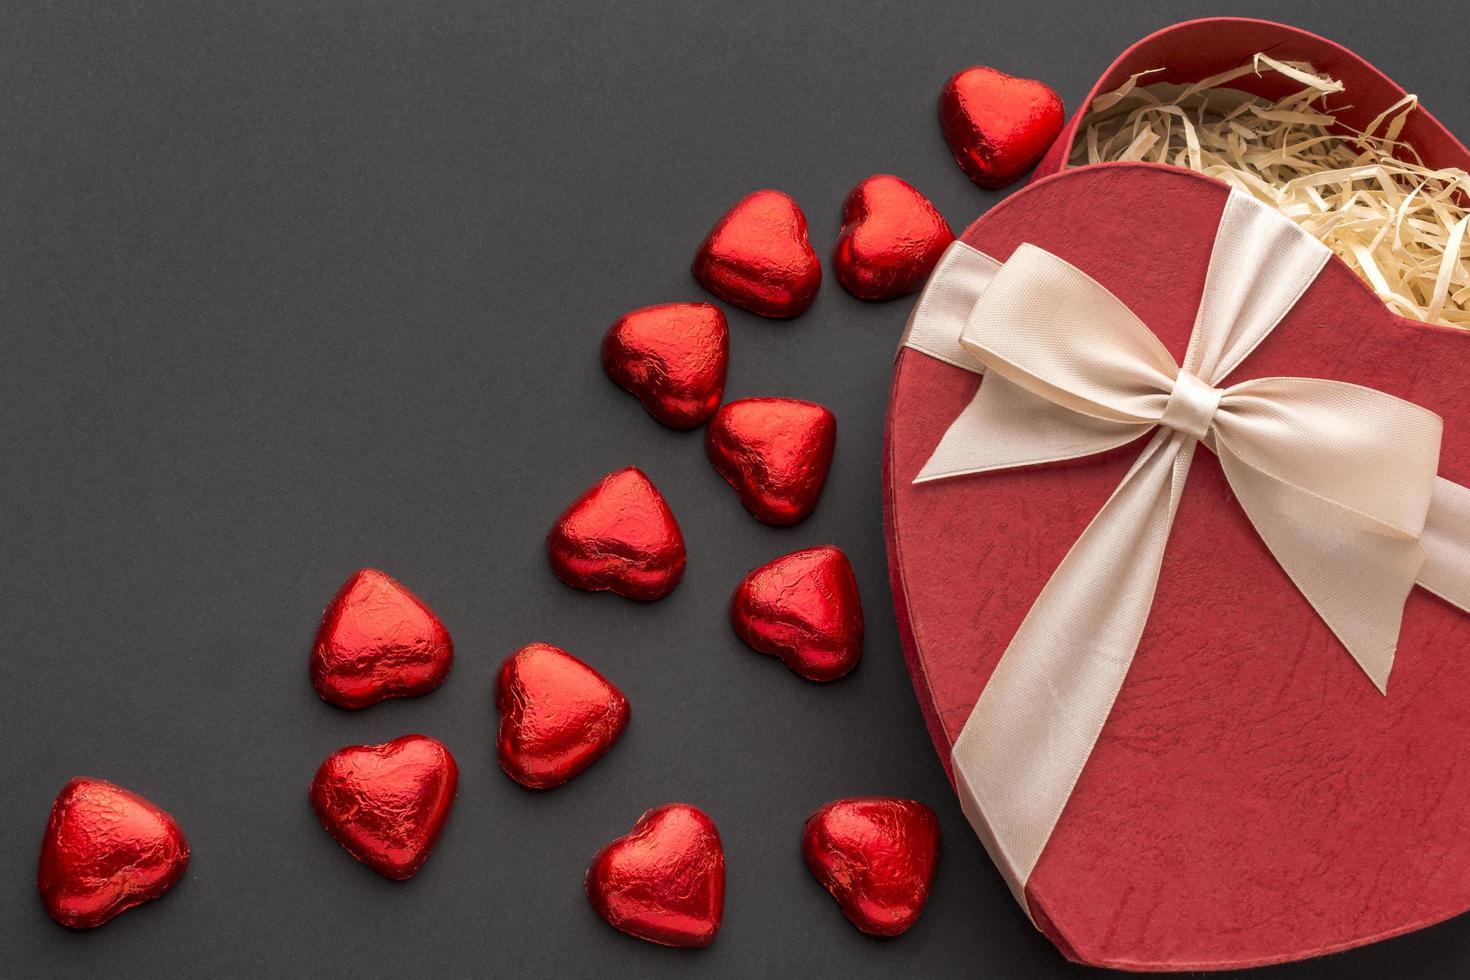 chocolats coeur rouge photo